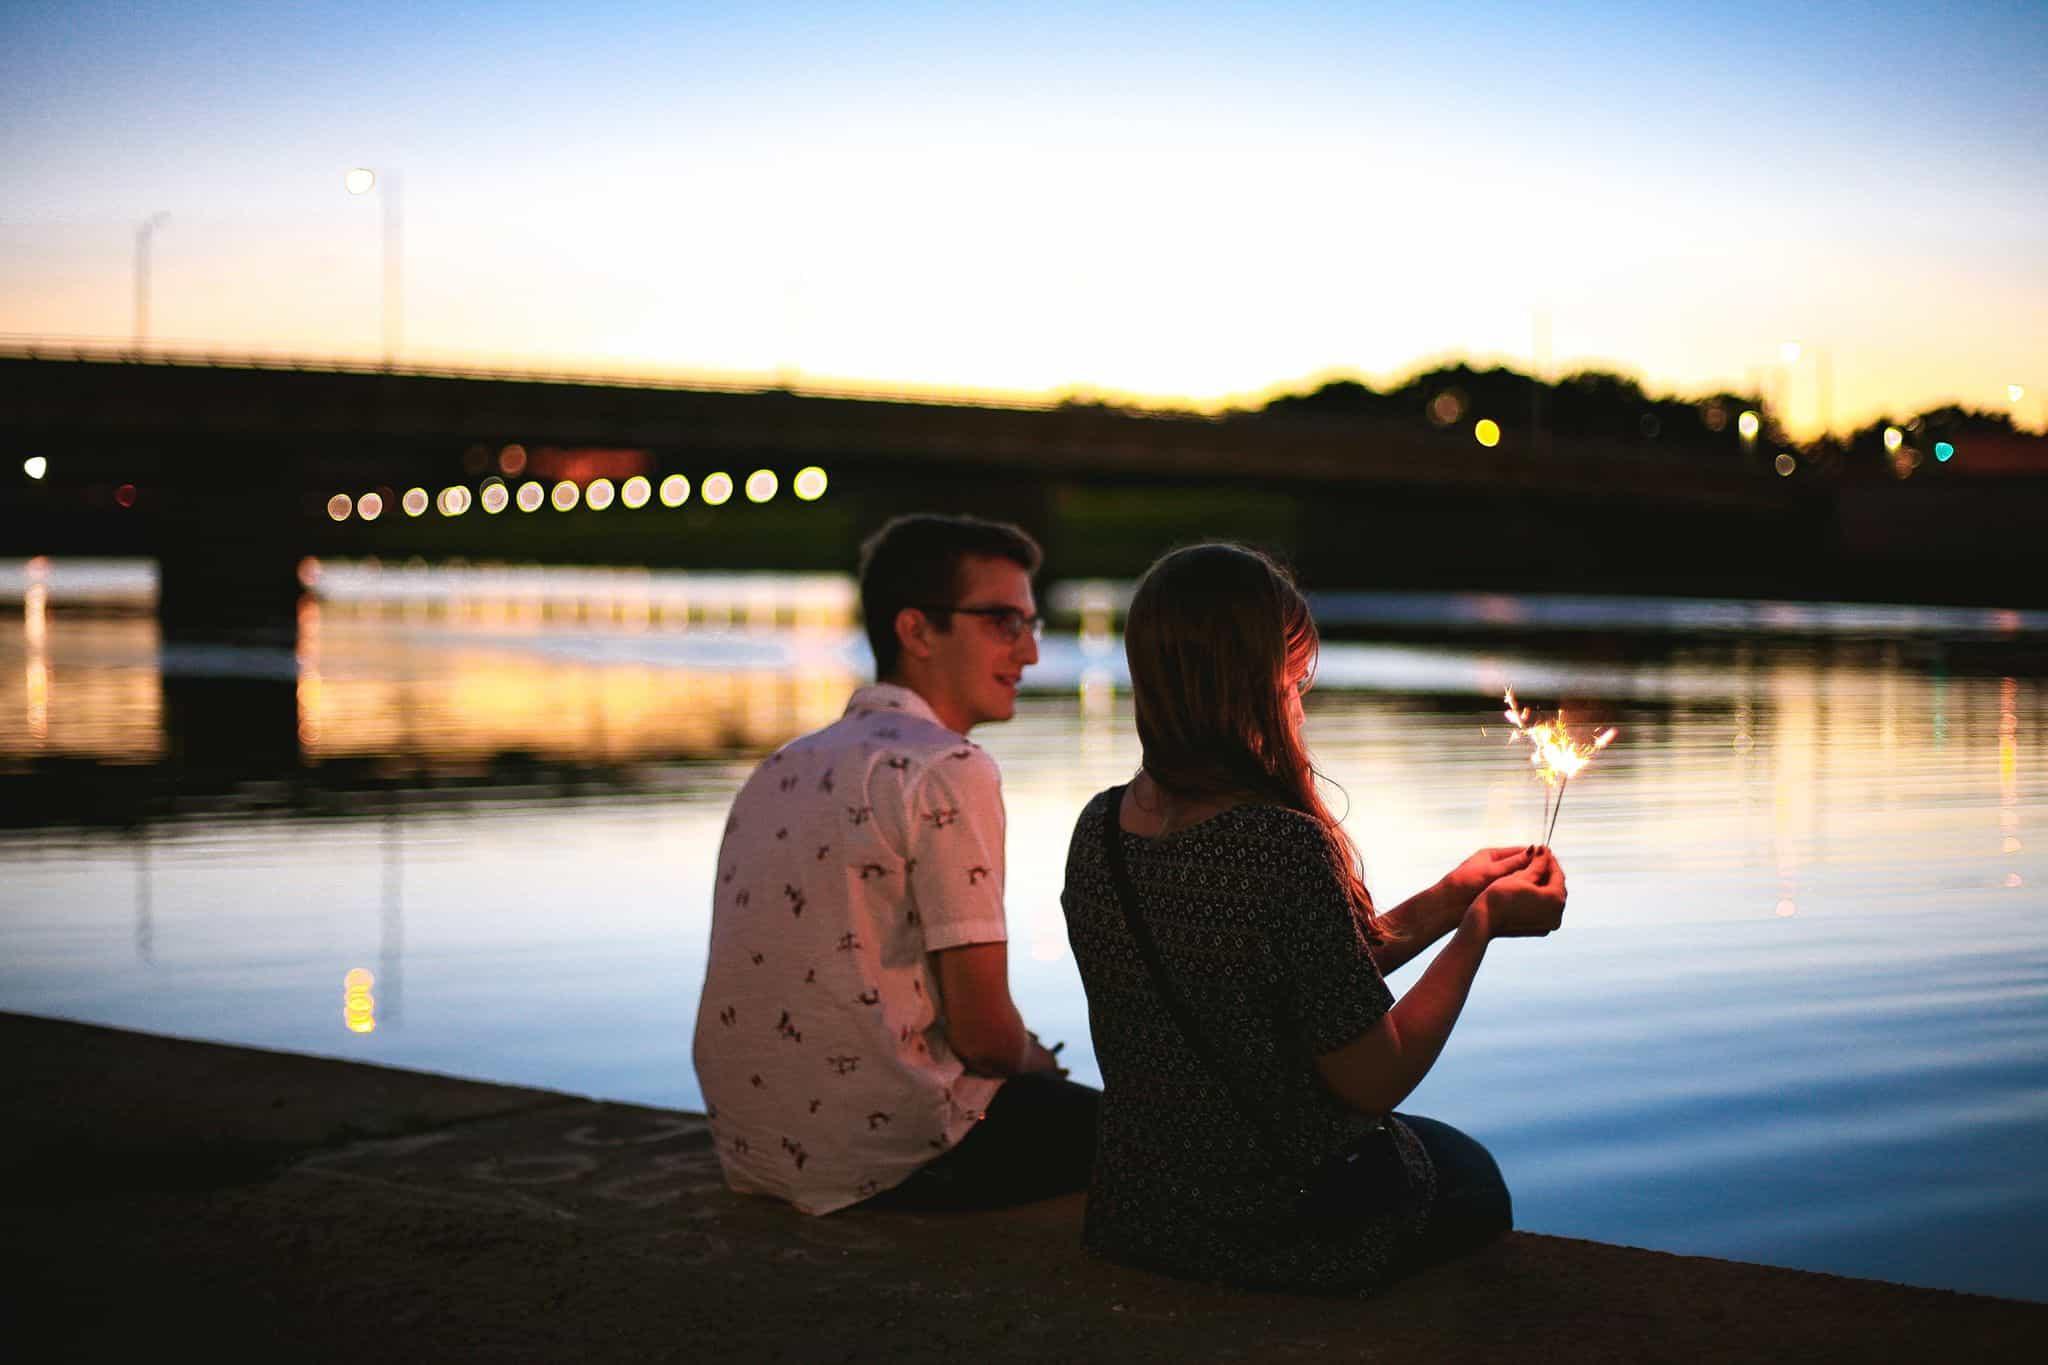 Adelaide Date Night Ideas - The Beachouse